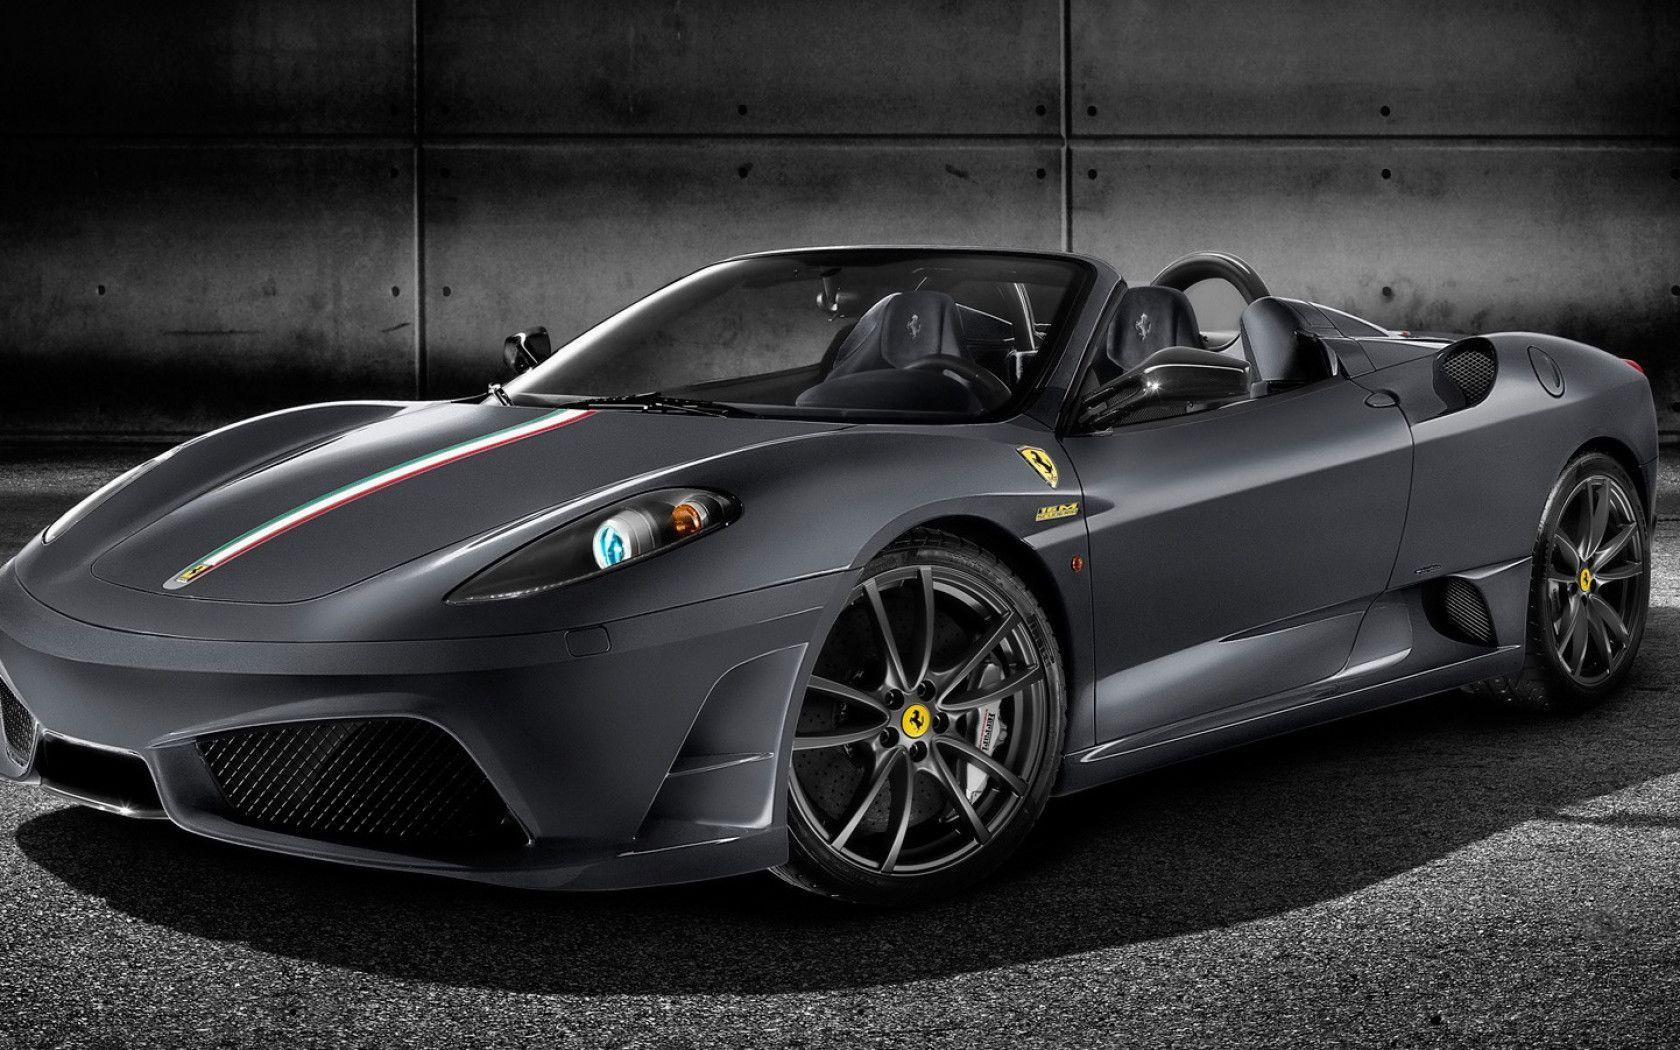 Black Ferrari Wallpaper For Mac #Ma5